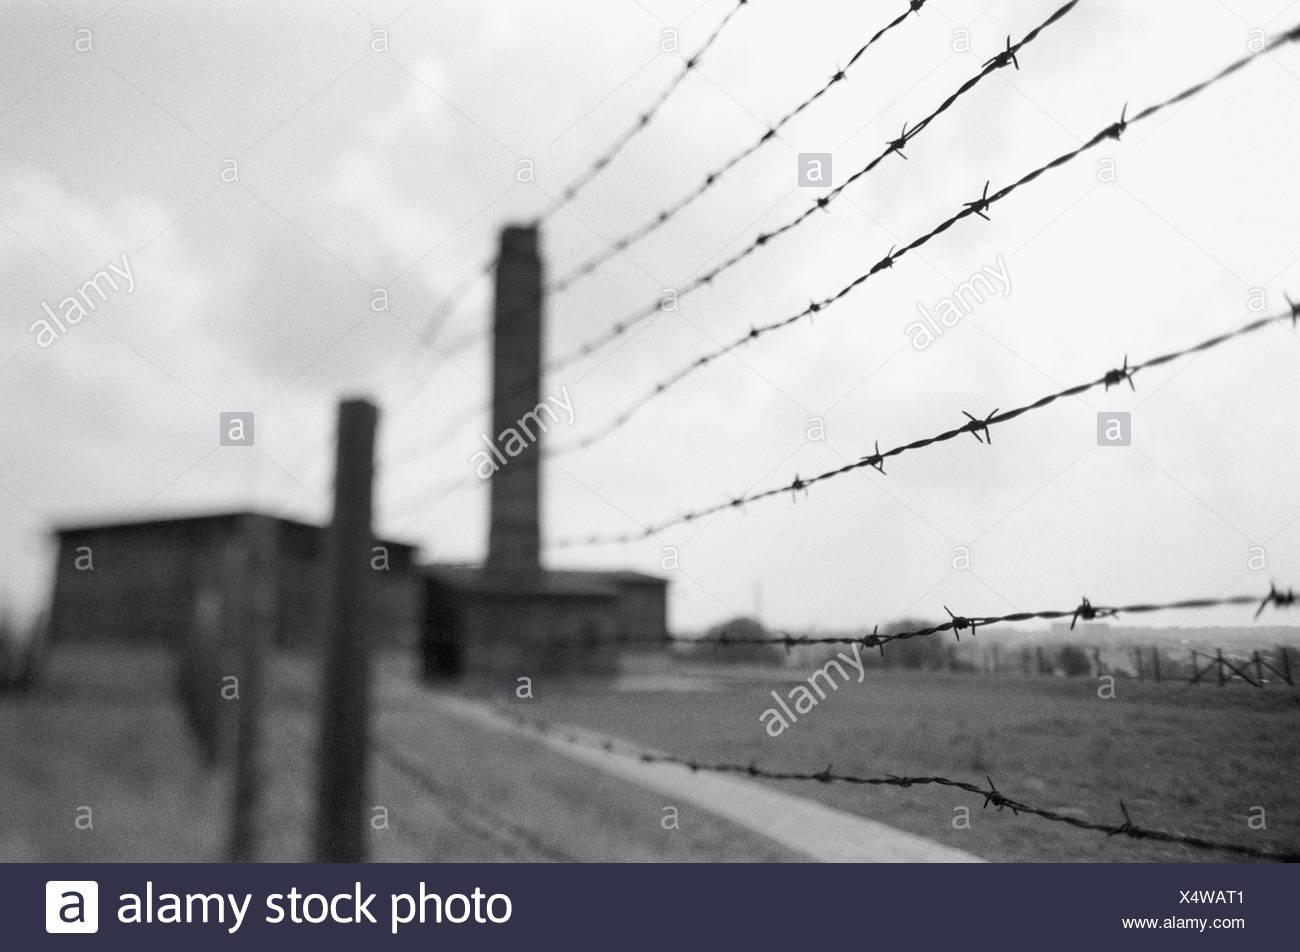 Weltkrieg Stock Photos & Weltkrieg Stock Images - Alamy